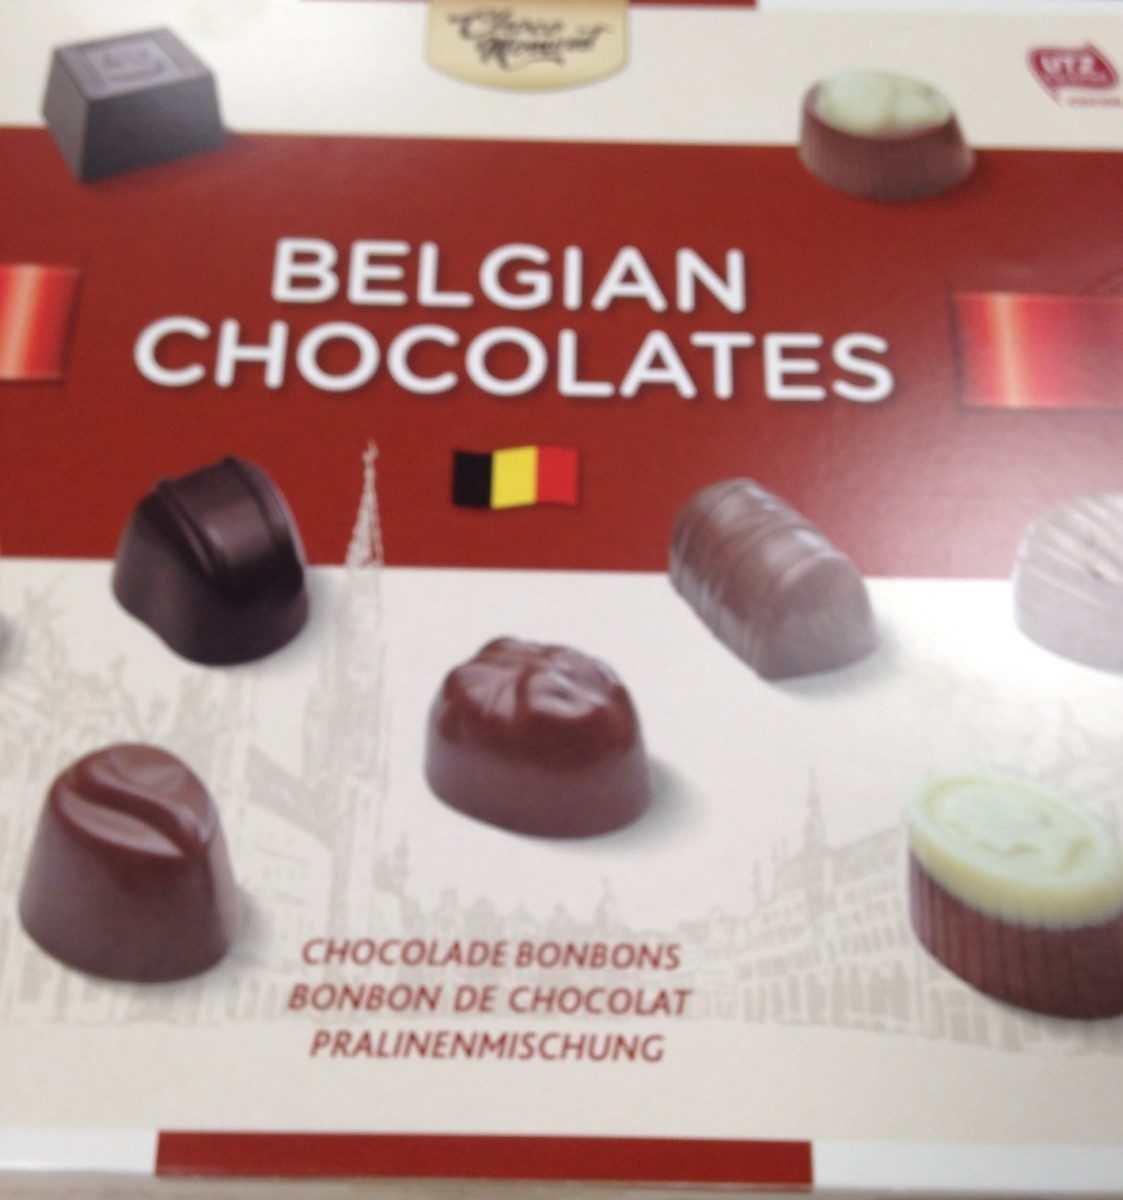 Belgian Chocolates - Product